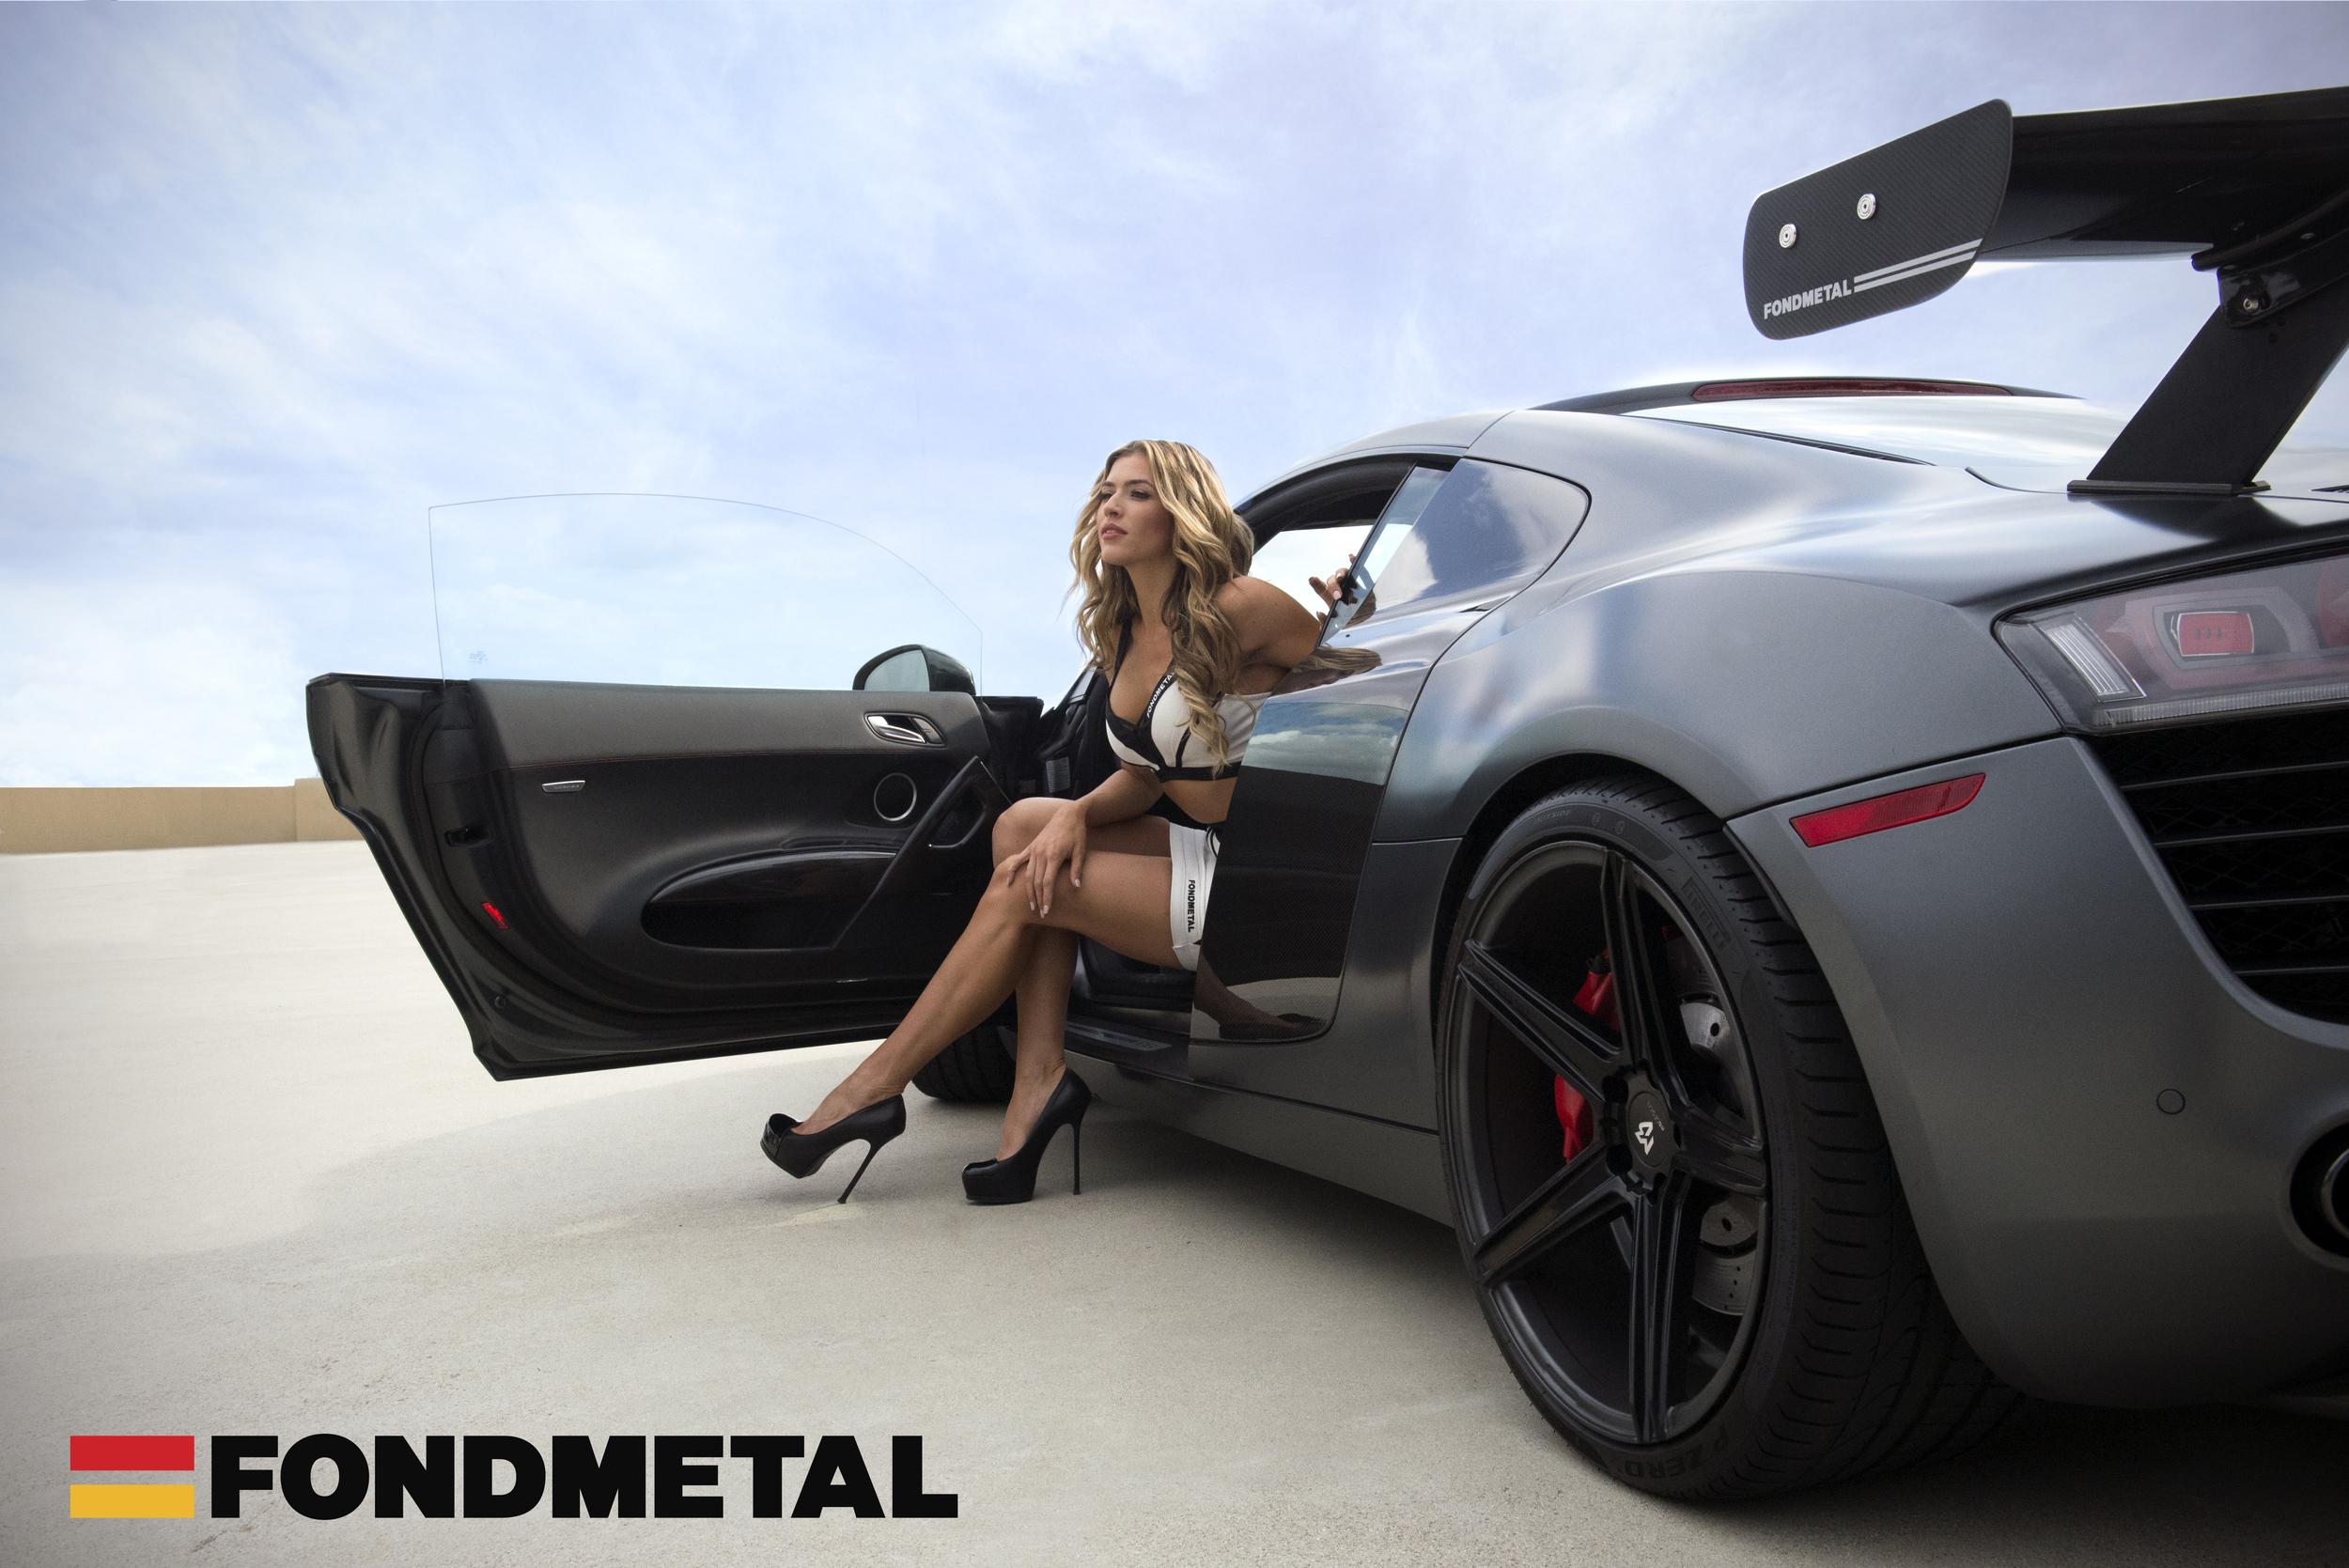 Audi-R8-Fondmetal-KV1-Black-Wheel-Model